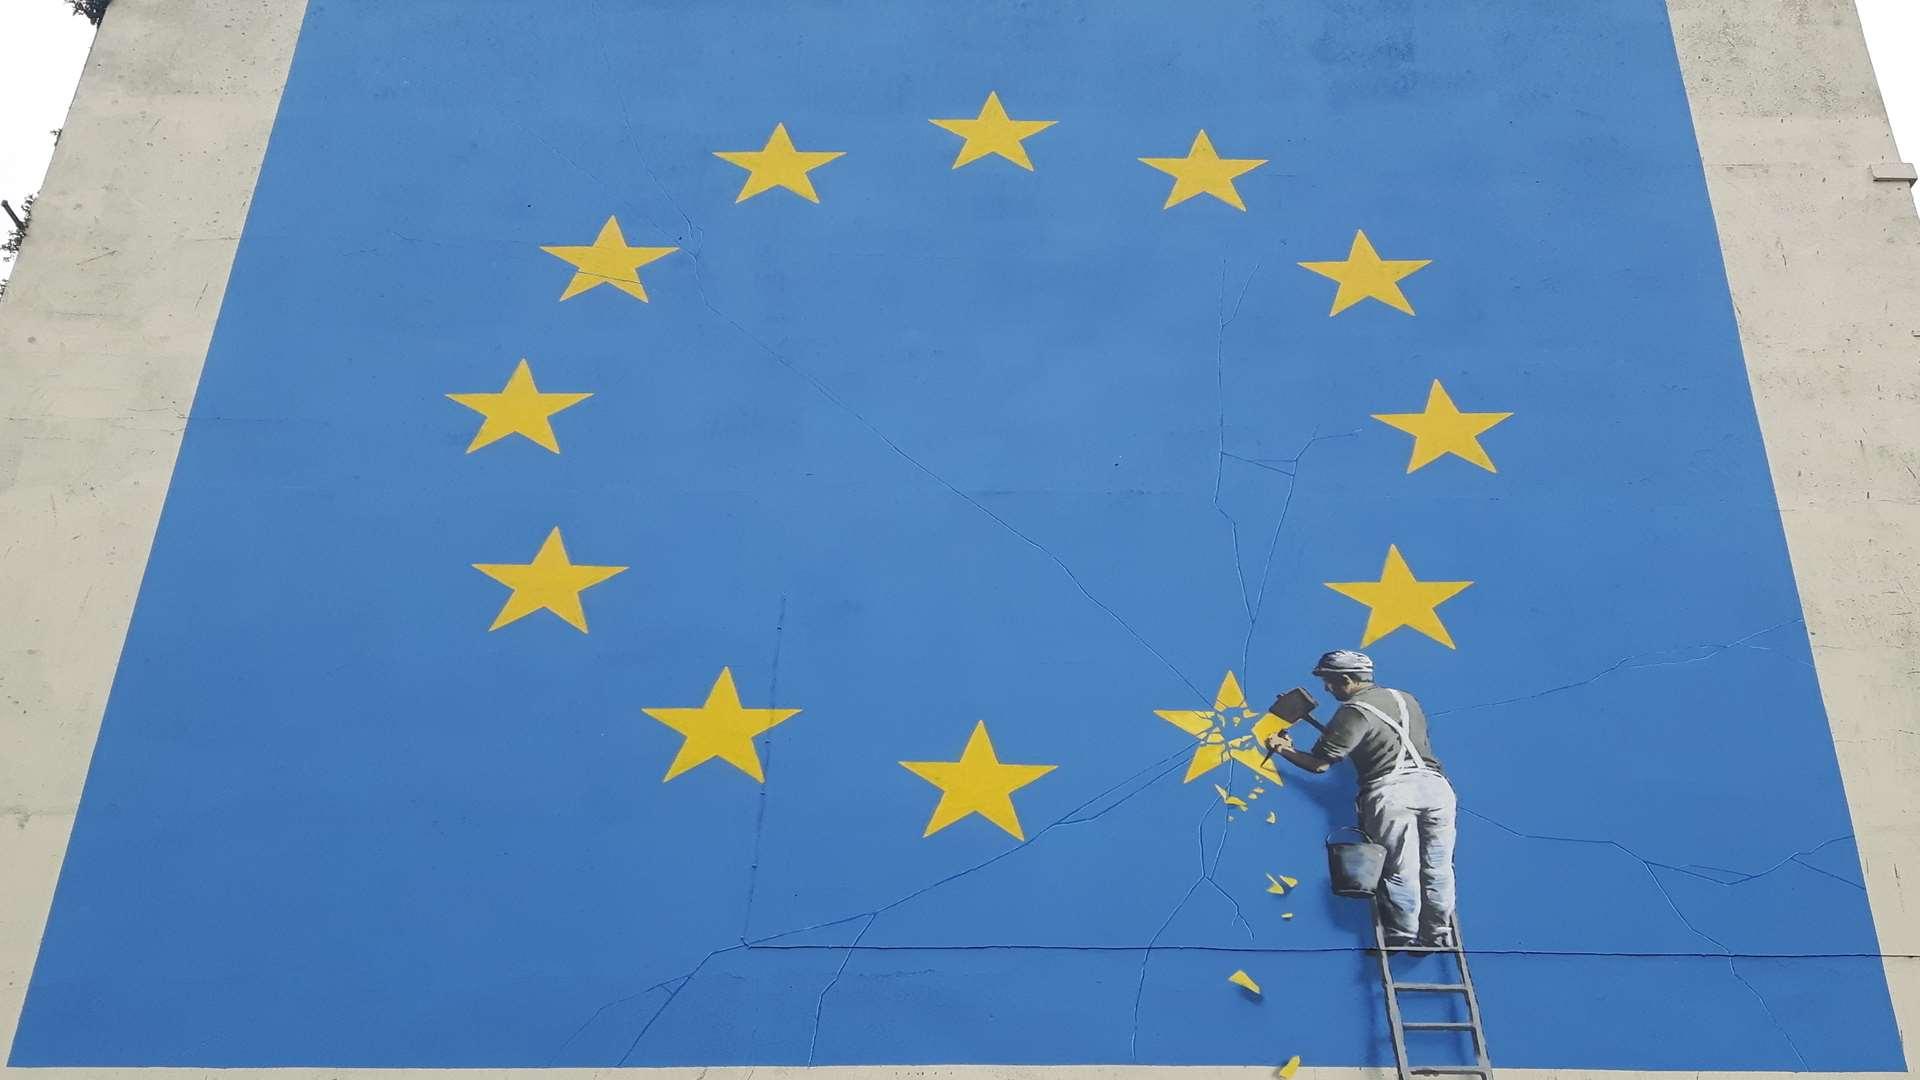 Godden Family Confirms Plans To Sell Banksy Artwork At